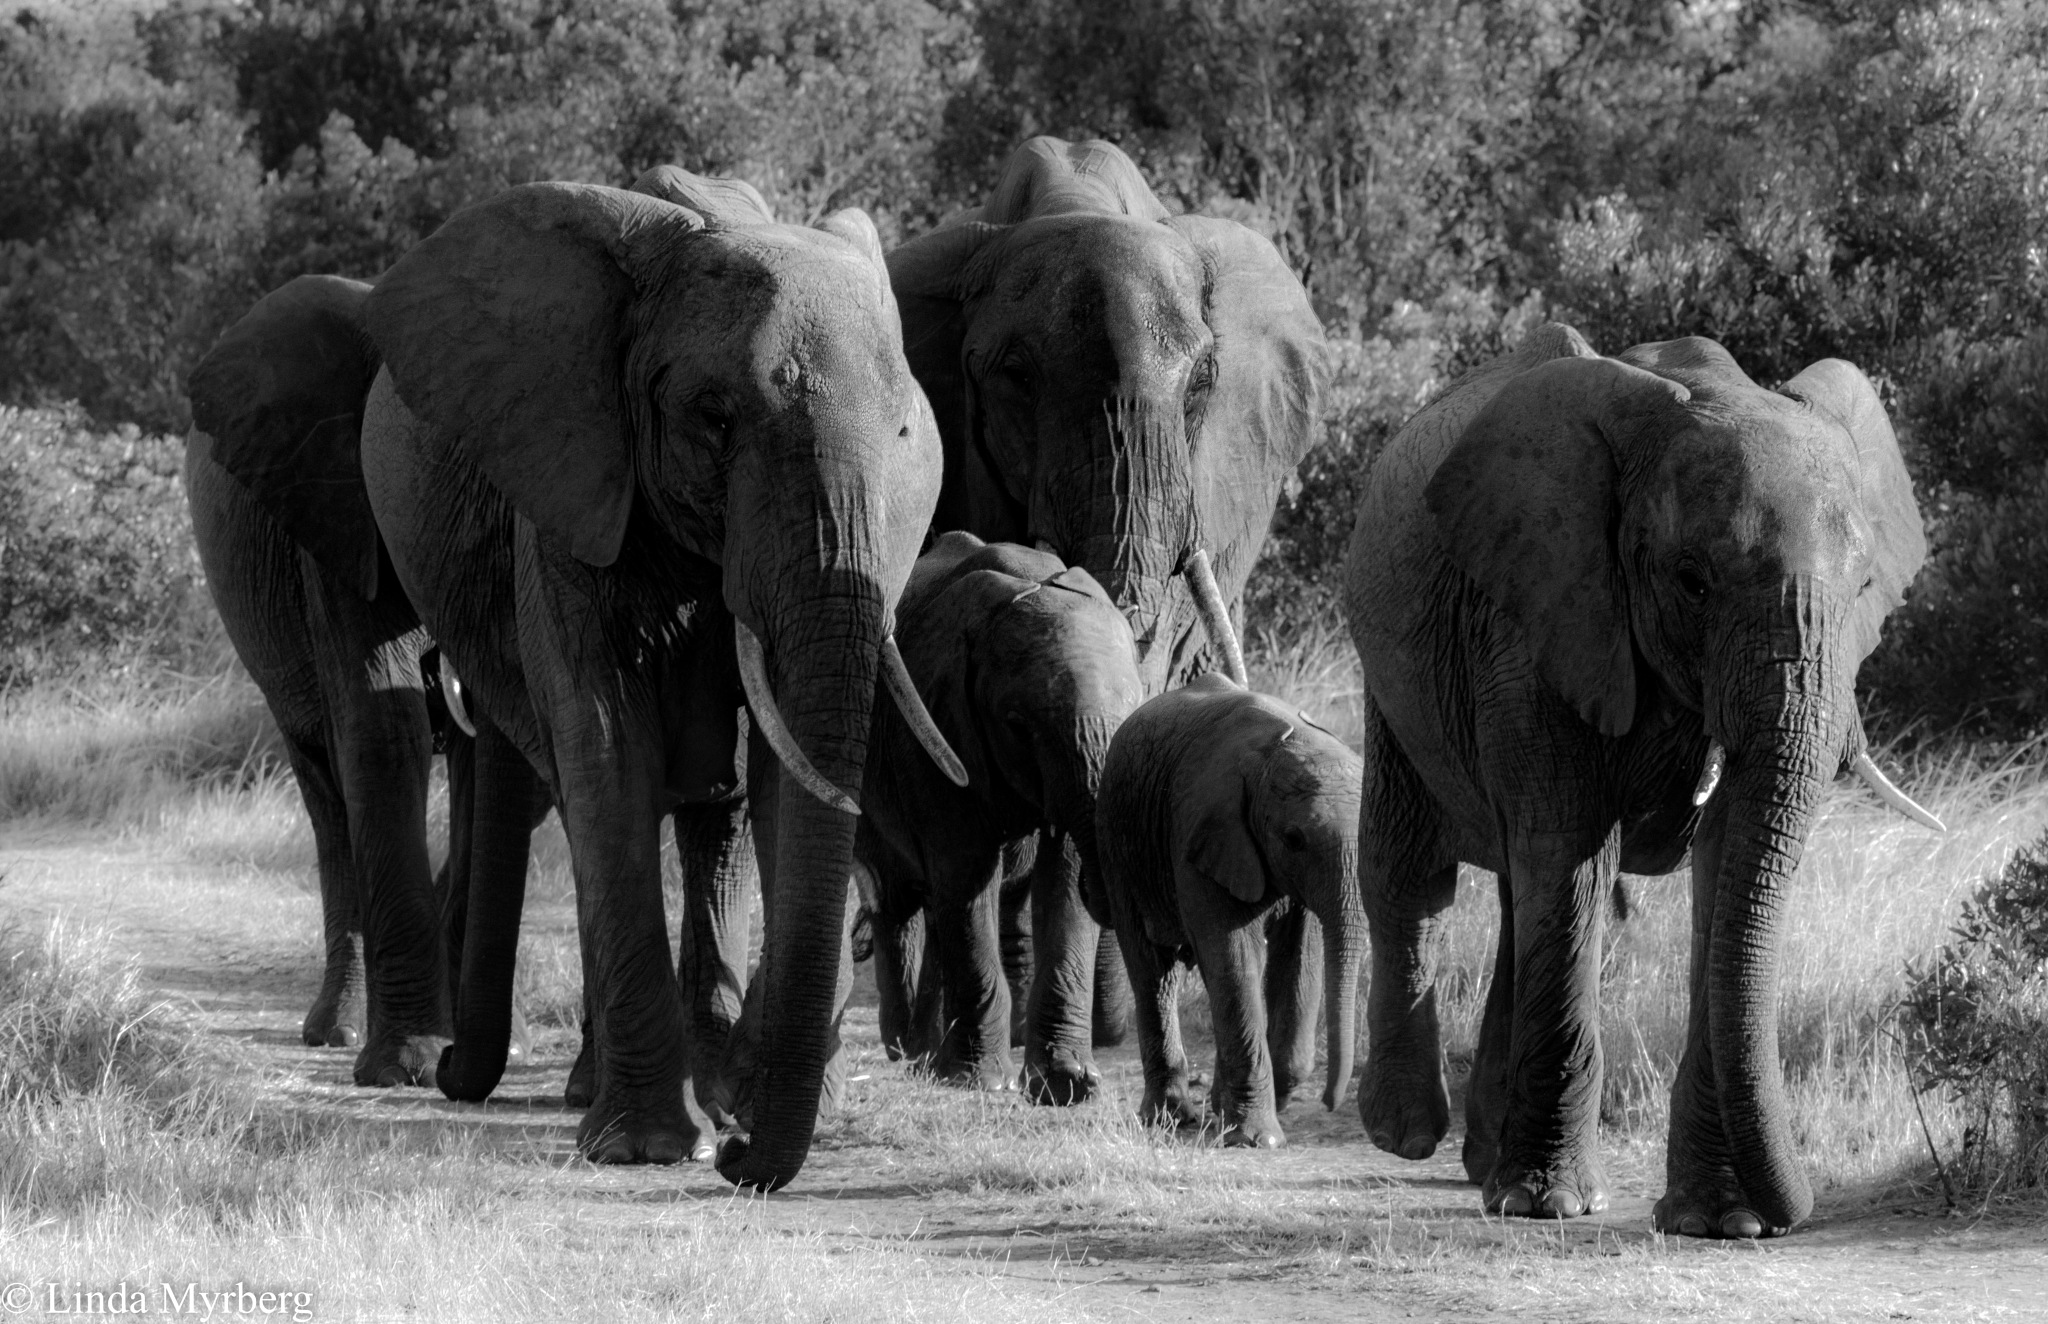 Elephant walk by Linda Myrberg